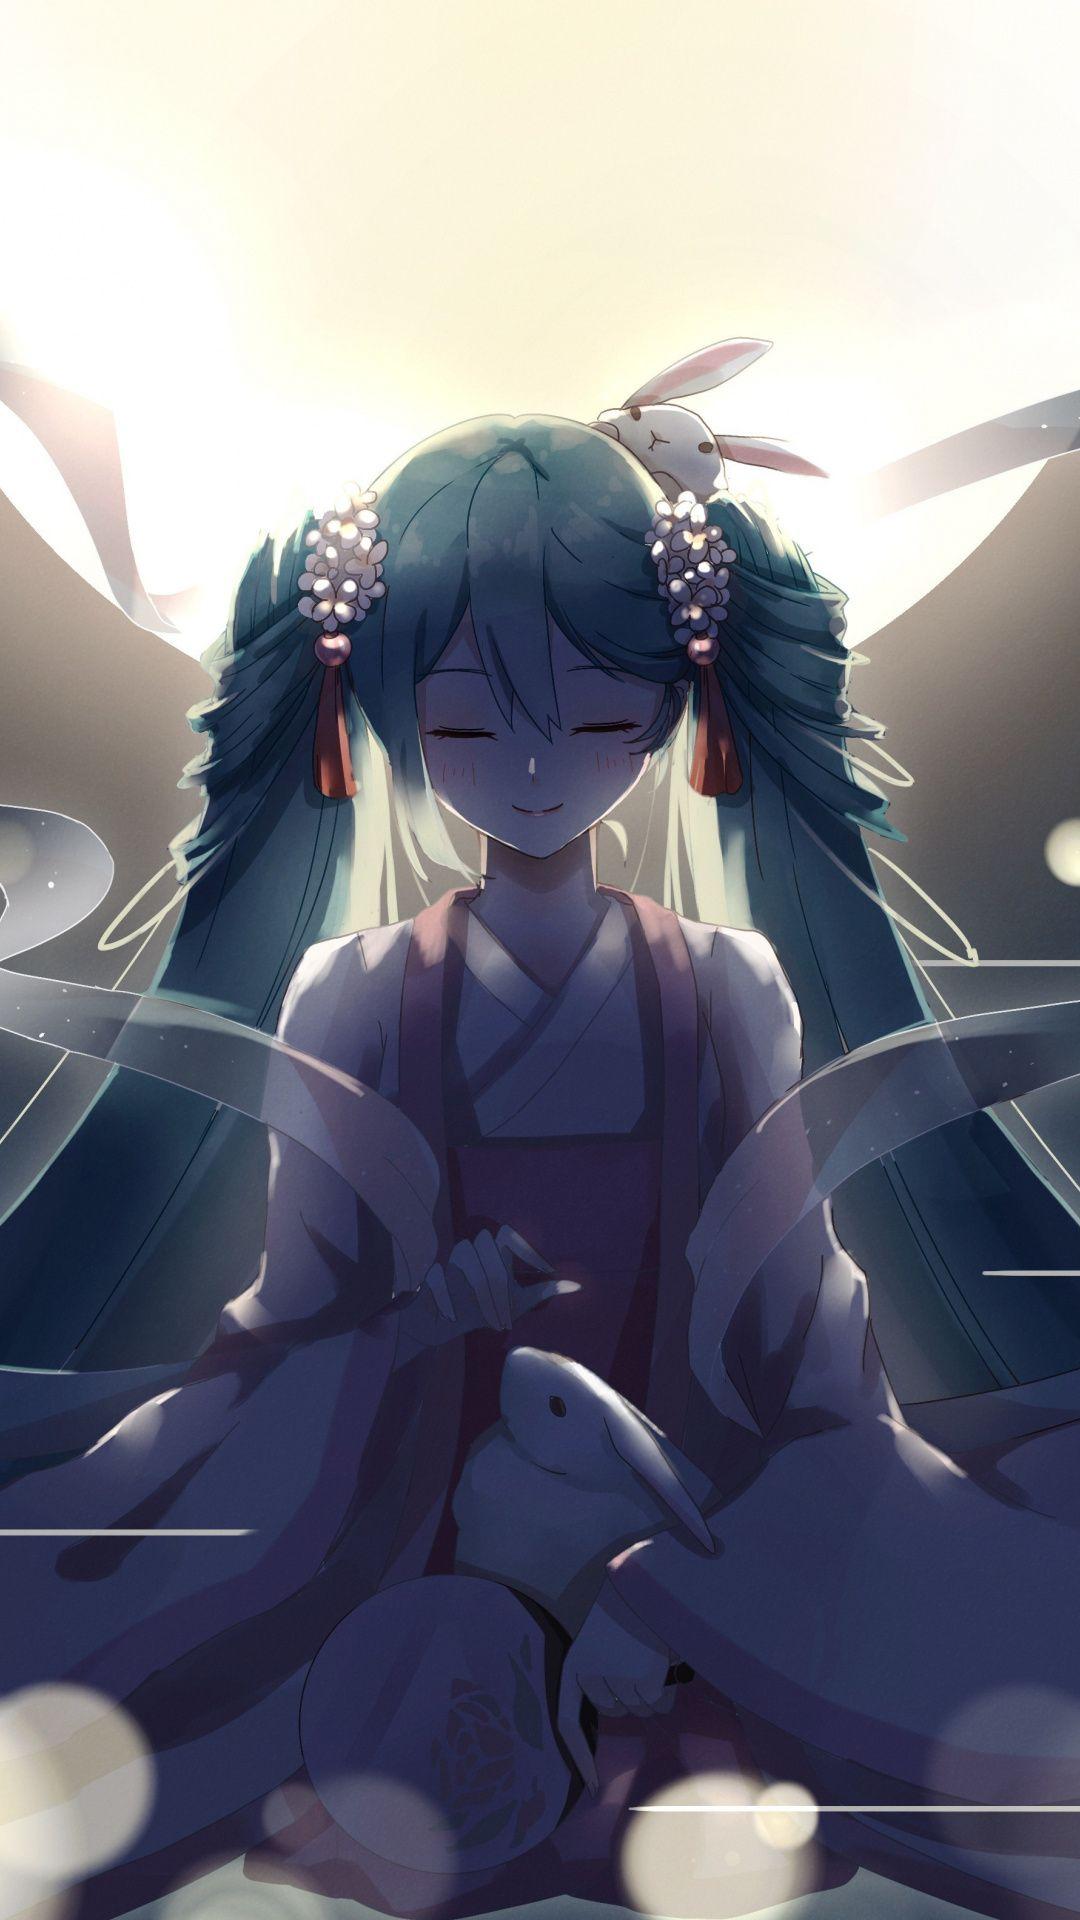 Pray, relaxed, Hatsune Miku, 1080x1920 wallpaper Anime